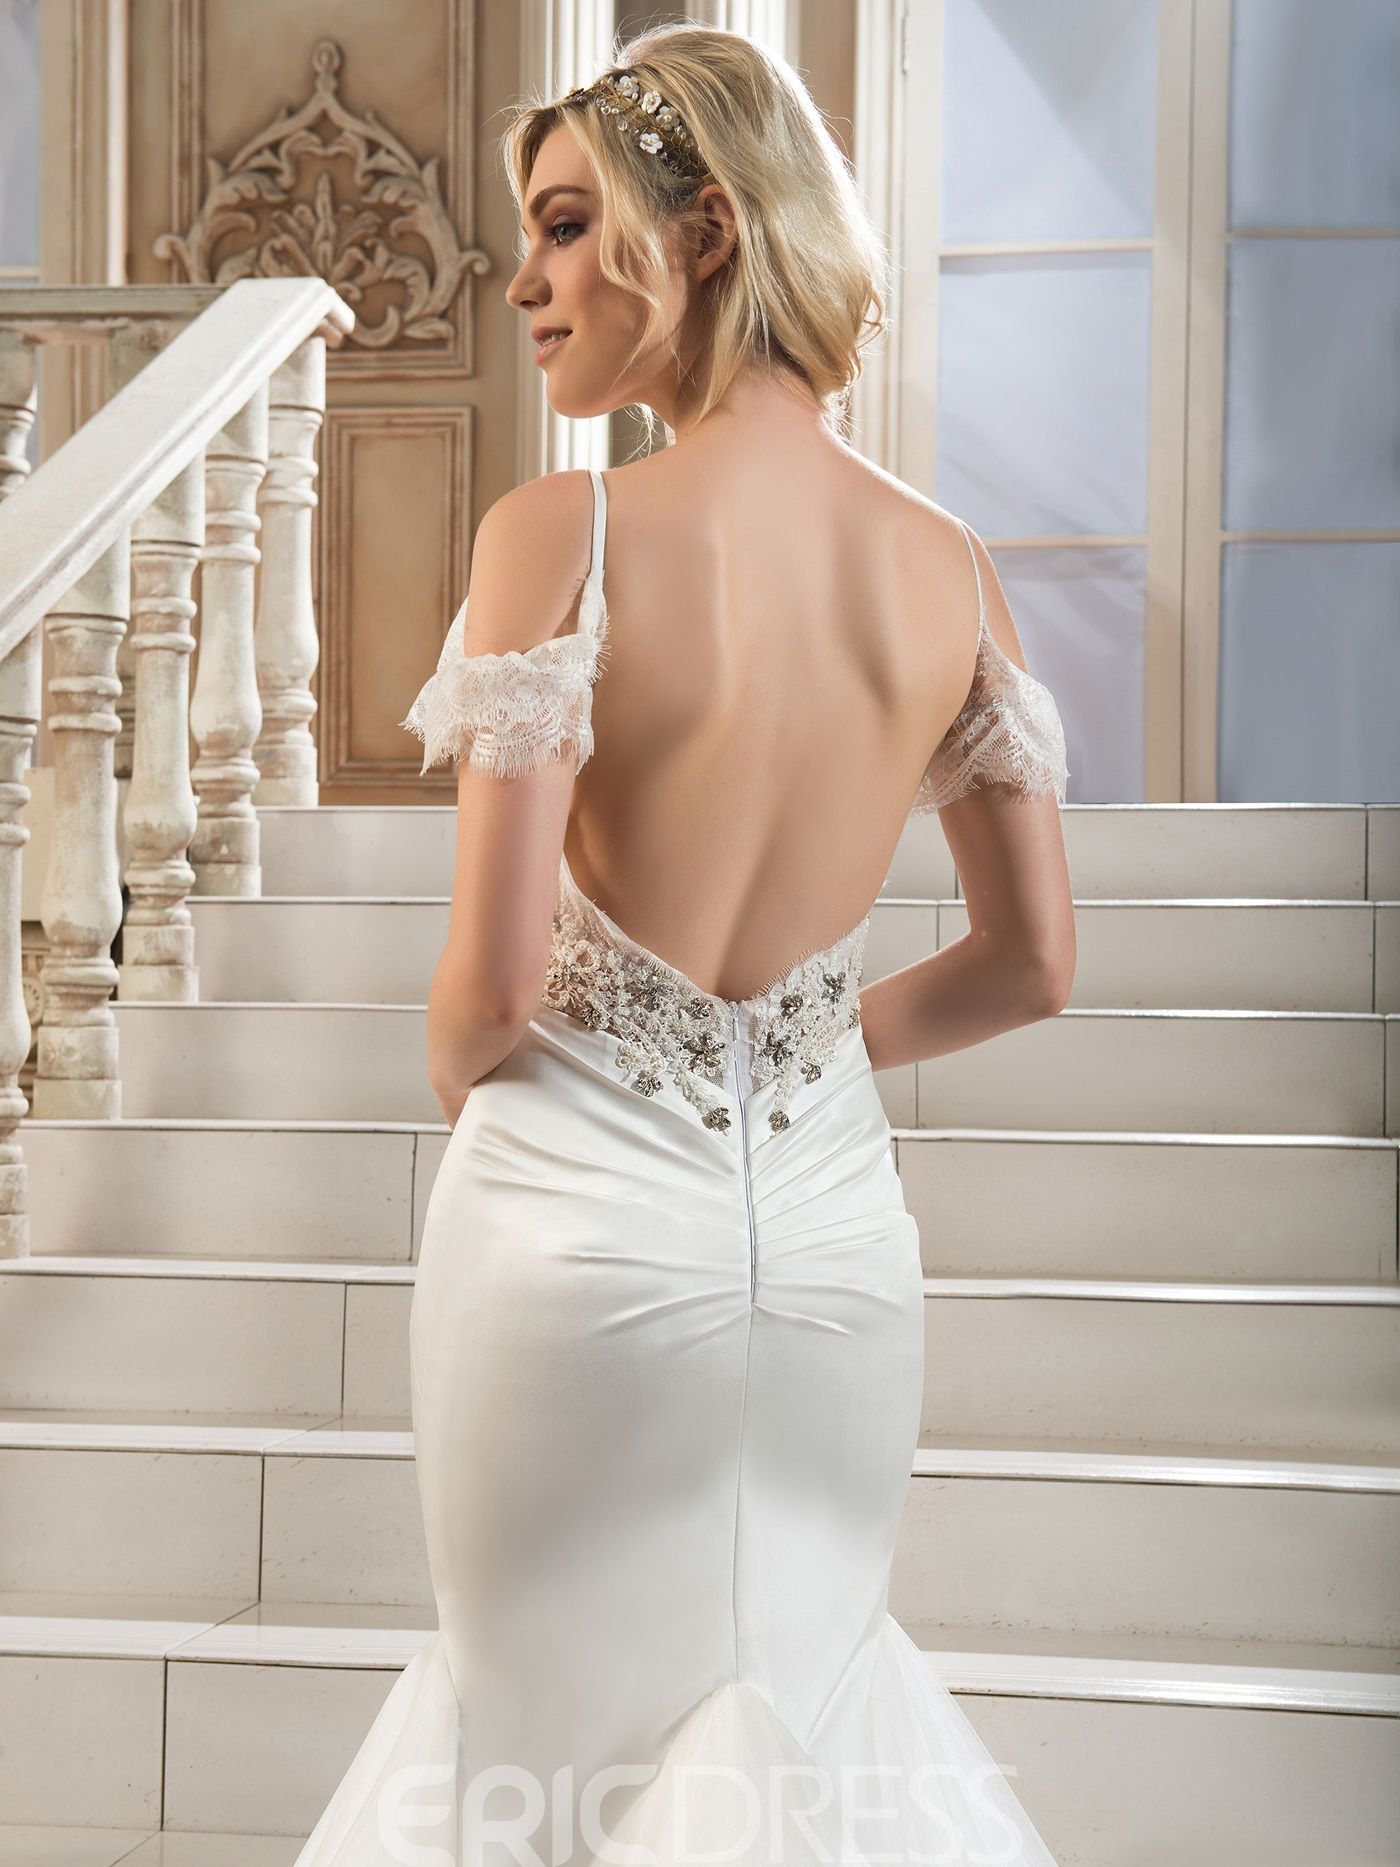 Ericdress Beautiful Spaghetti Straps Beaded Mermaid Wedding Dress 12201791 - EricDress.com